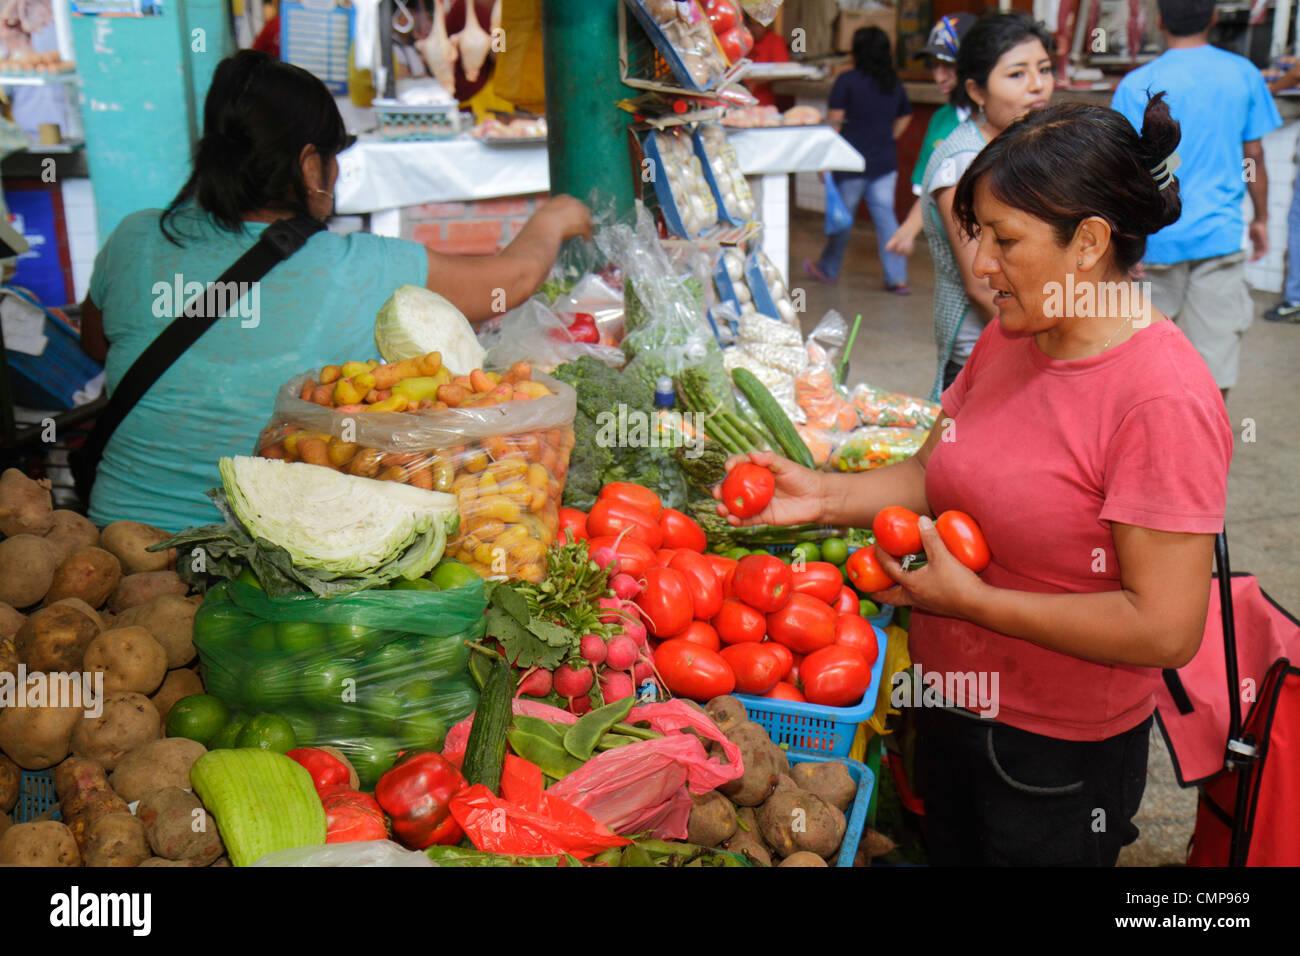 Lima Peru Surquillo Mercado de Surquillo market stall business shopping vendor produce vegetables potatoes radishes - Stock Image